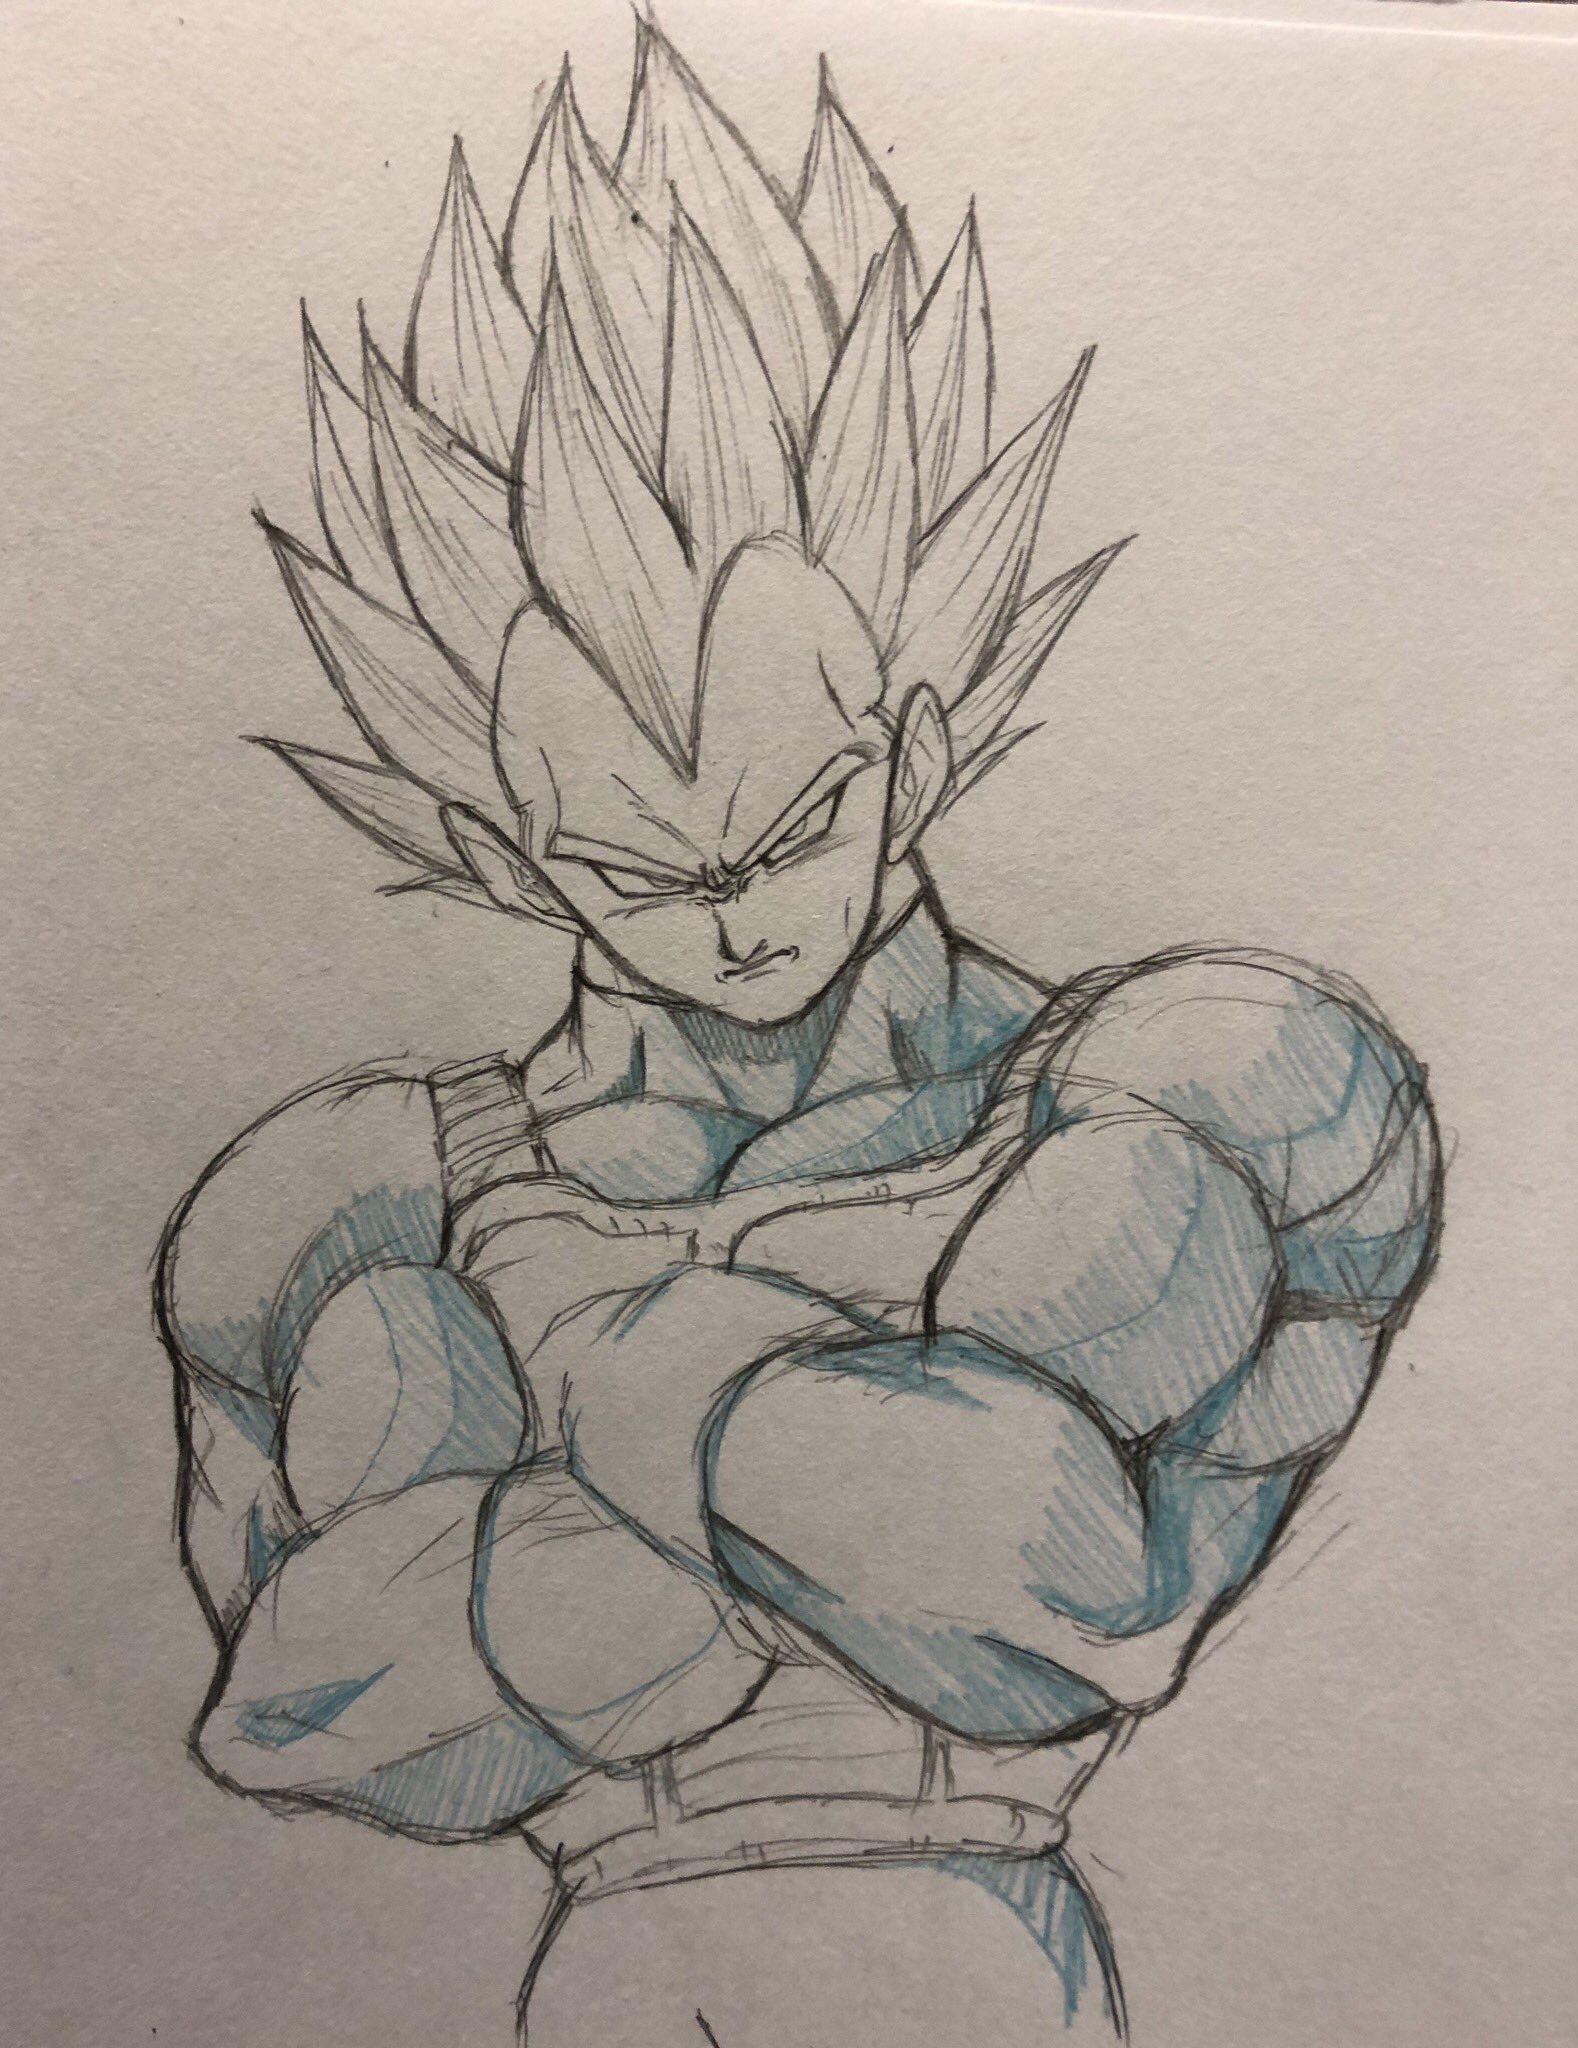 Best anime drawings dbz drawings pencil drawings manga dragon